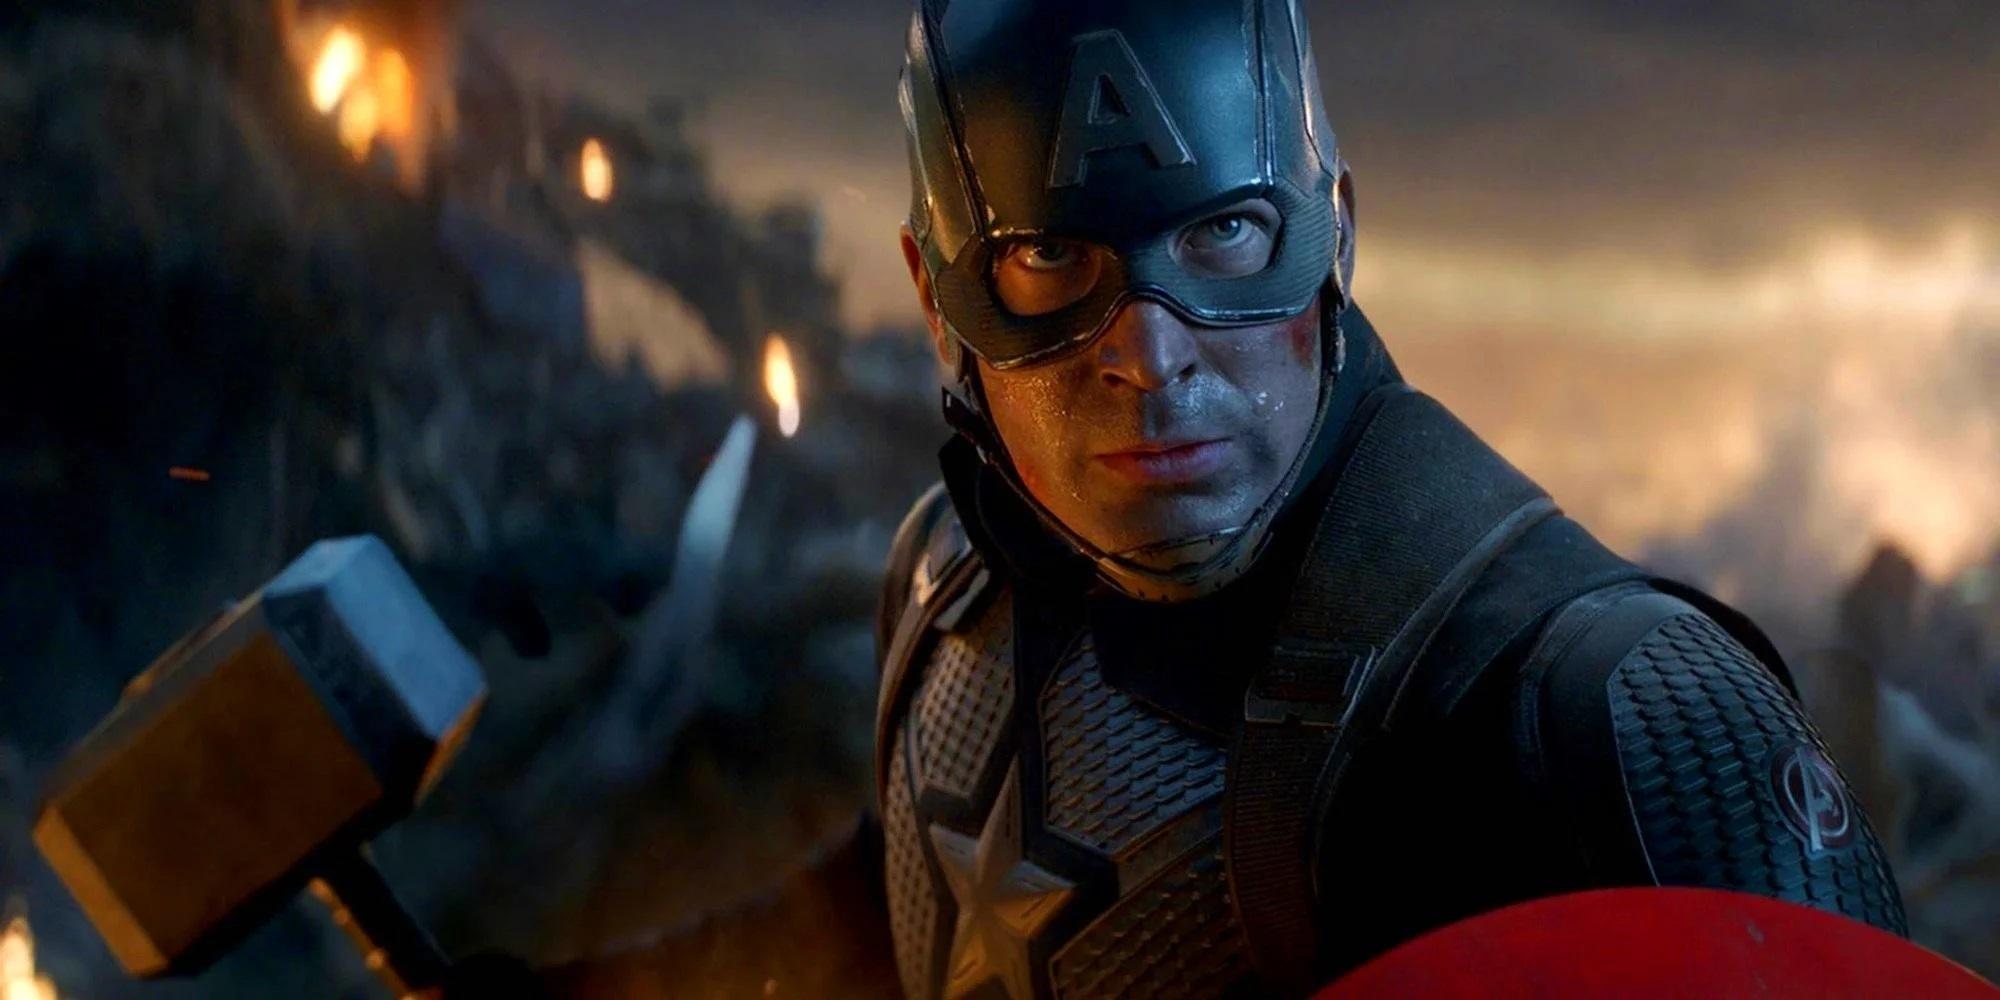 Chris Evans odhalil, ze kterého momentu Avengers: Endgame je dodnes naměkko | Fandíme filmu